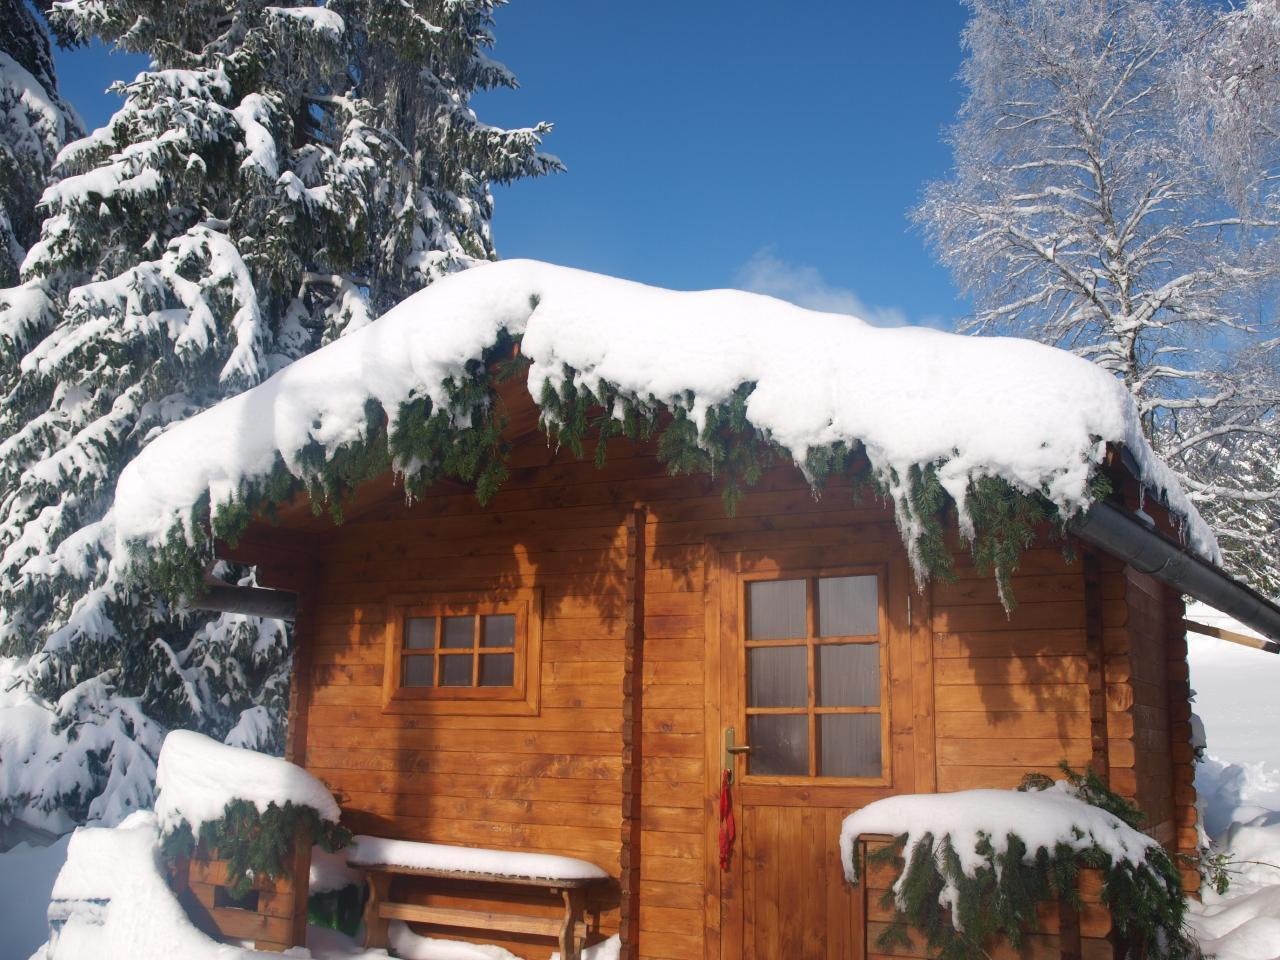 Ferienhaus Steinhäuschen Shila, im Naturparc der Vogesen,  mit Saunahaus (1717460), La Rosière, Haute-Saône, Franche-Comté, Frankreich, Bild 25